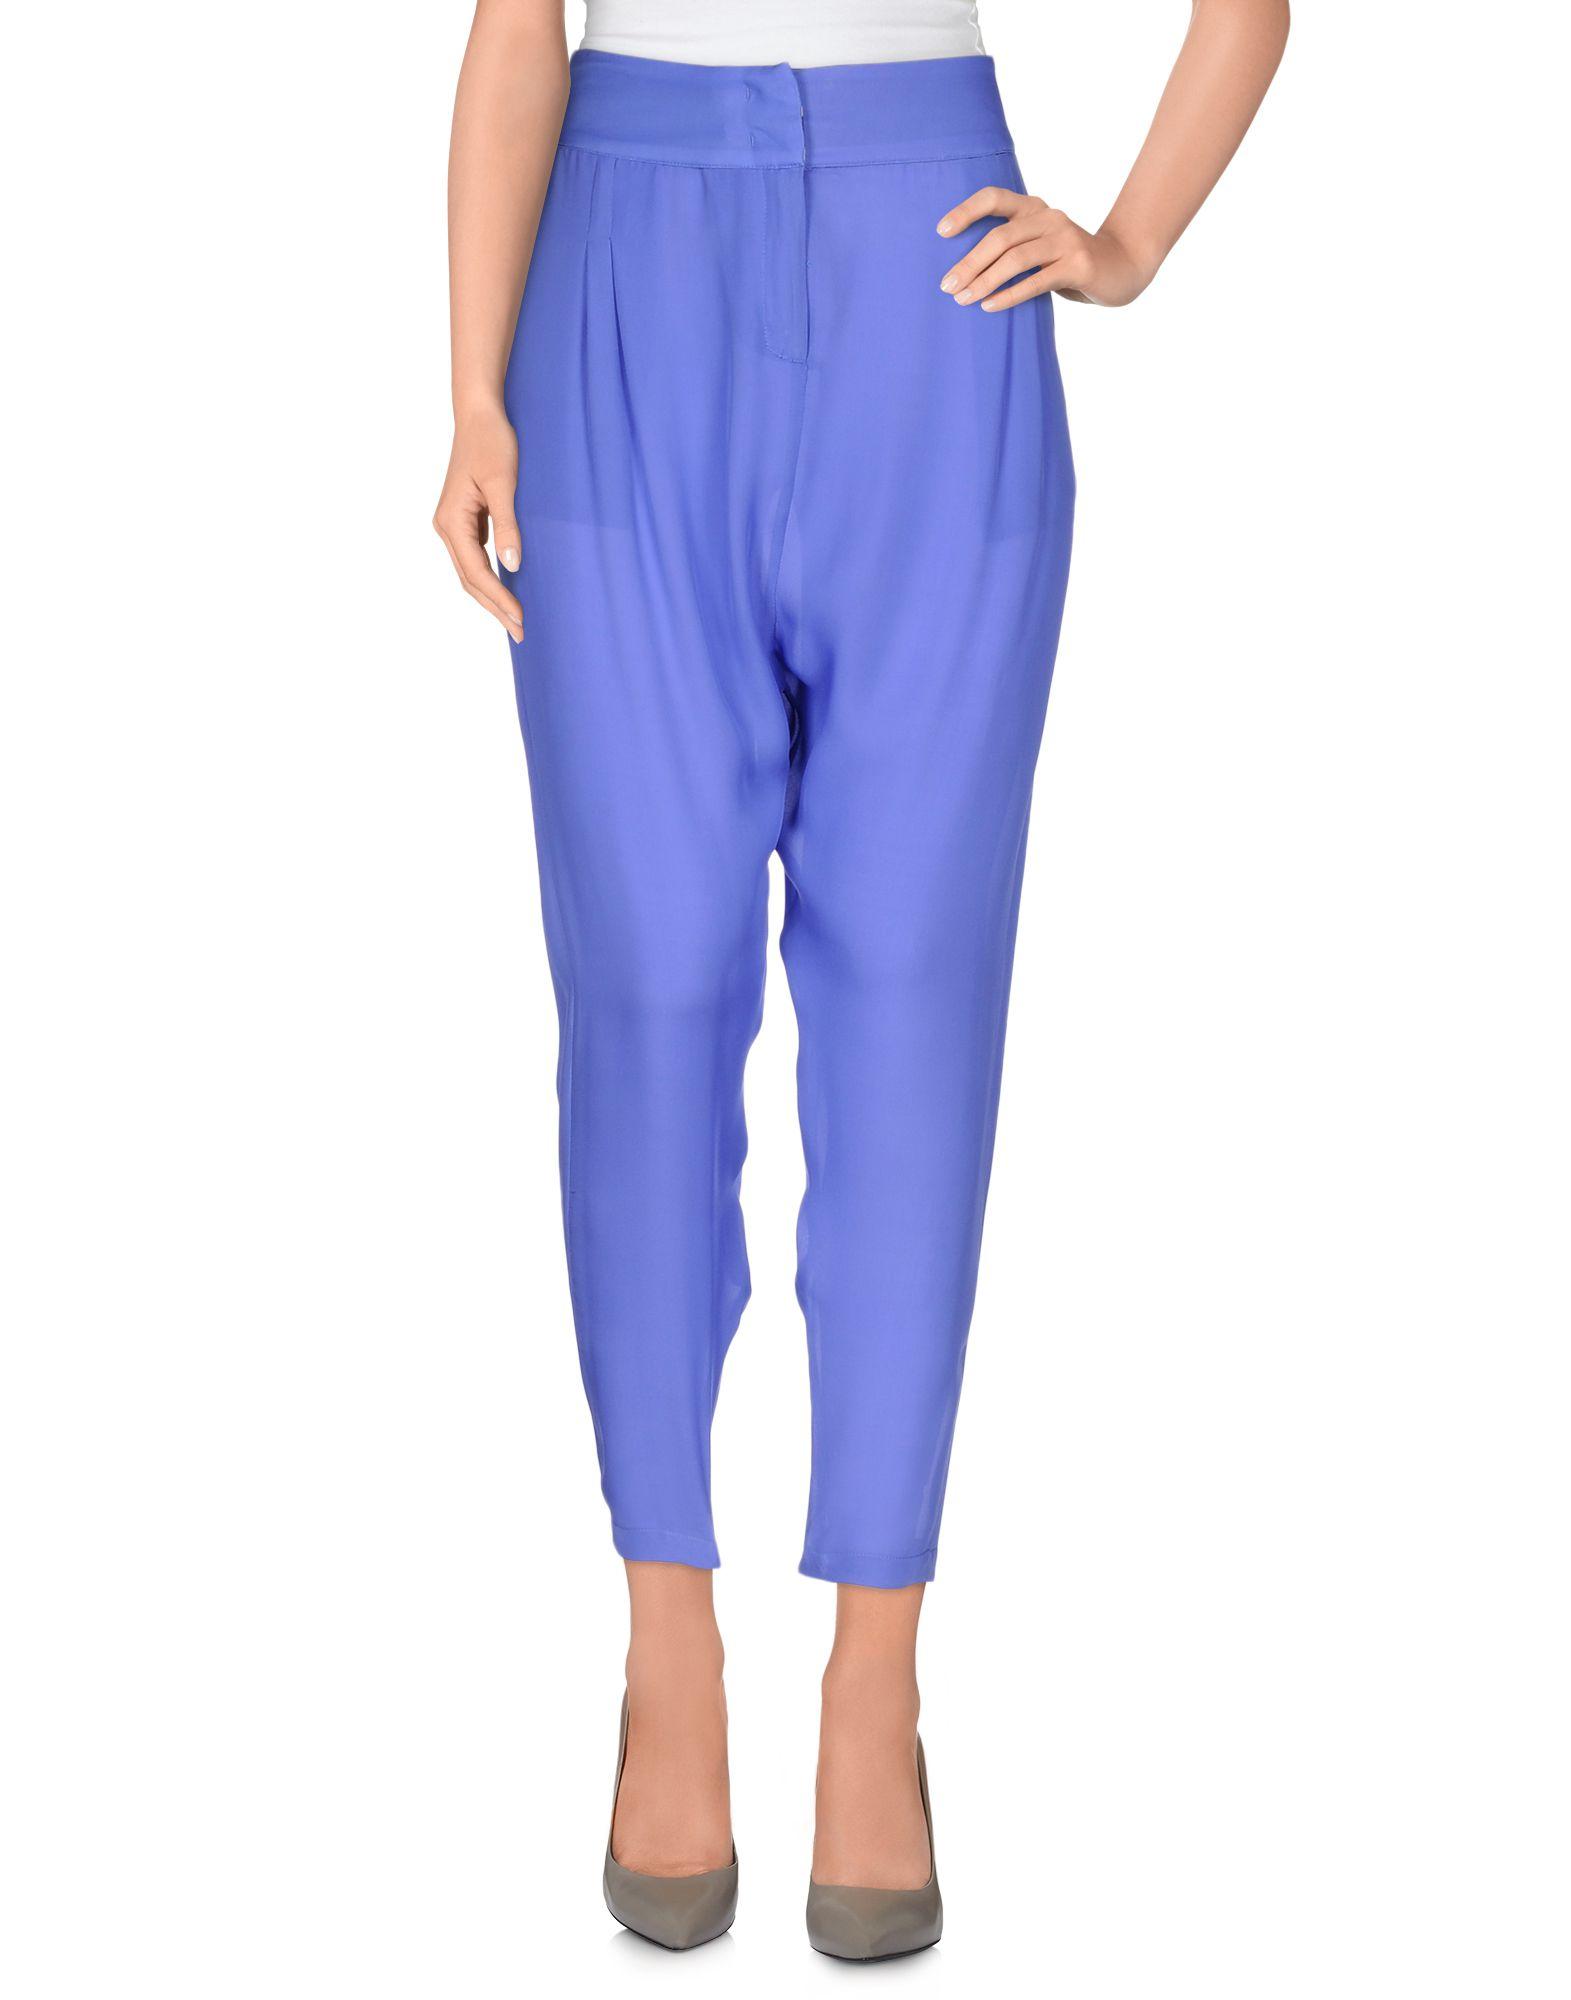 Pantalone Just Just Cavalli donna - 36746301FE  extrem niedrige Preise